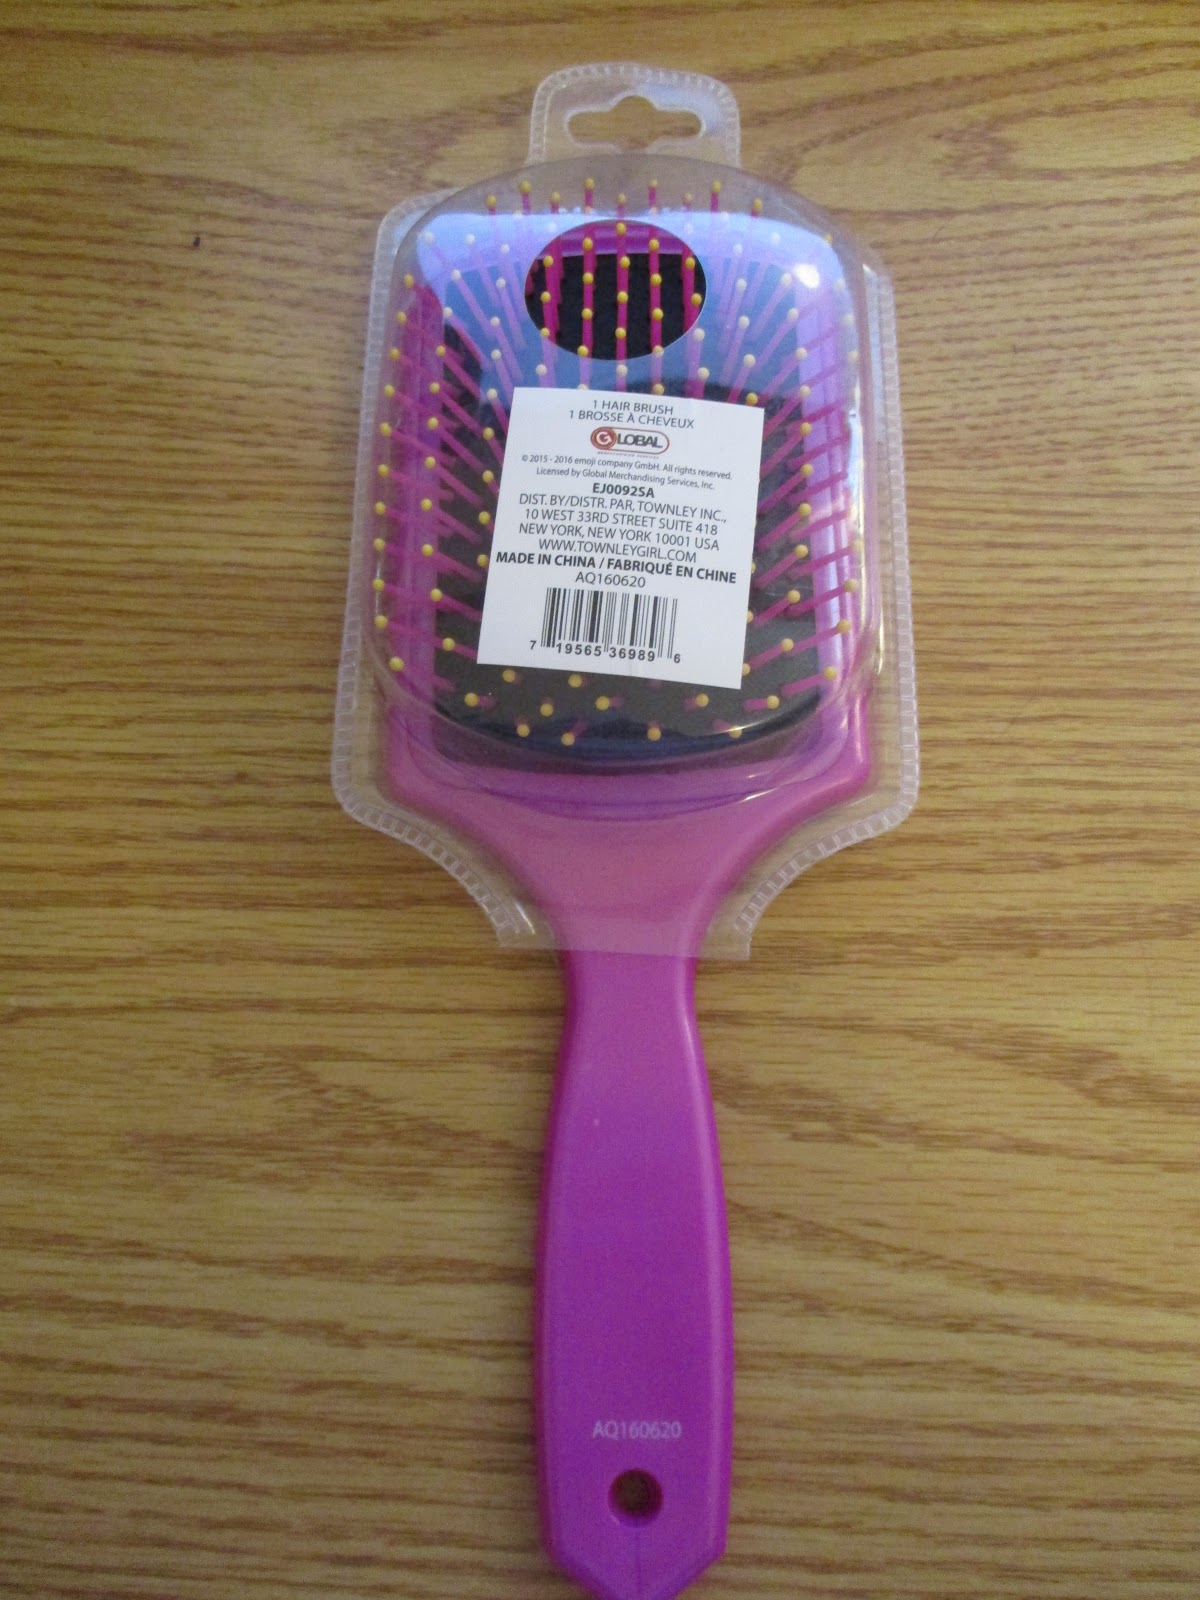 Missys Product Reviews : Townley Girl & Disney Tsum Tsum Hair Clips